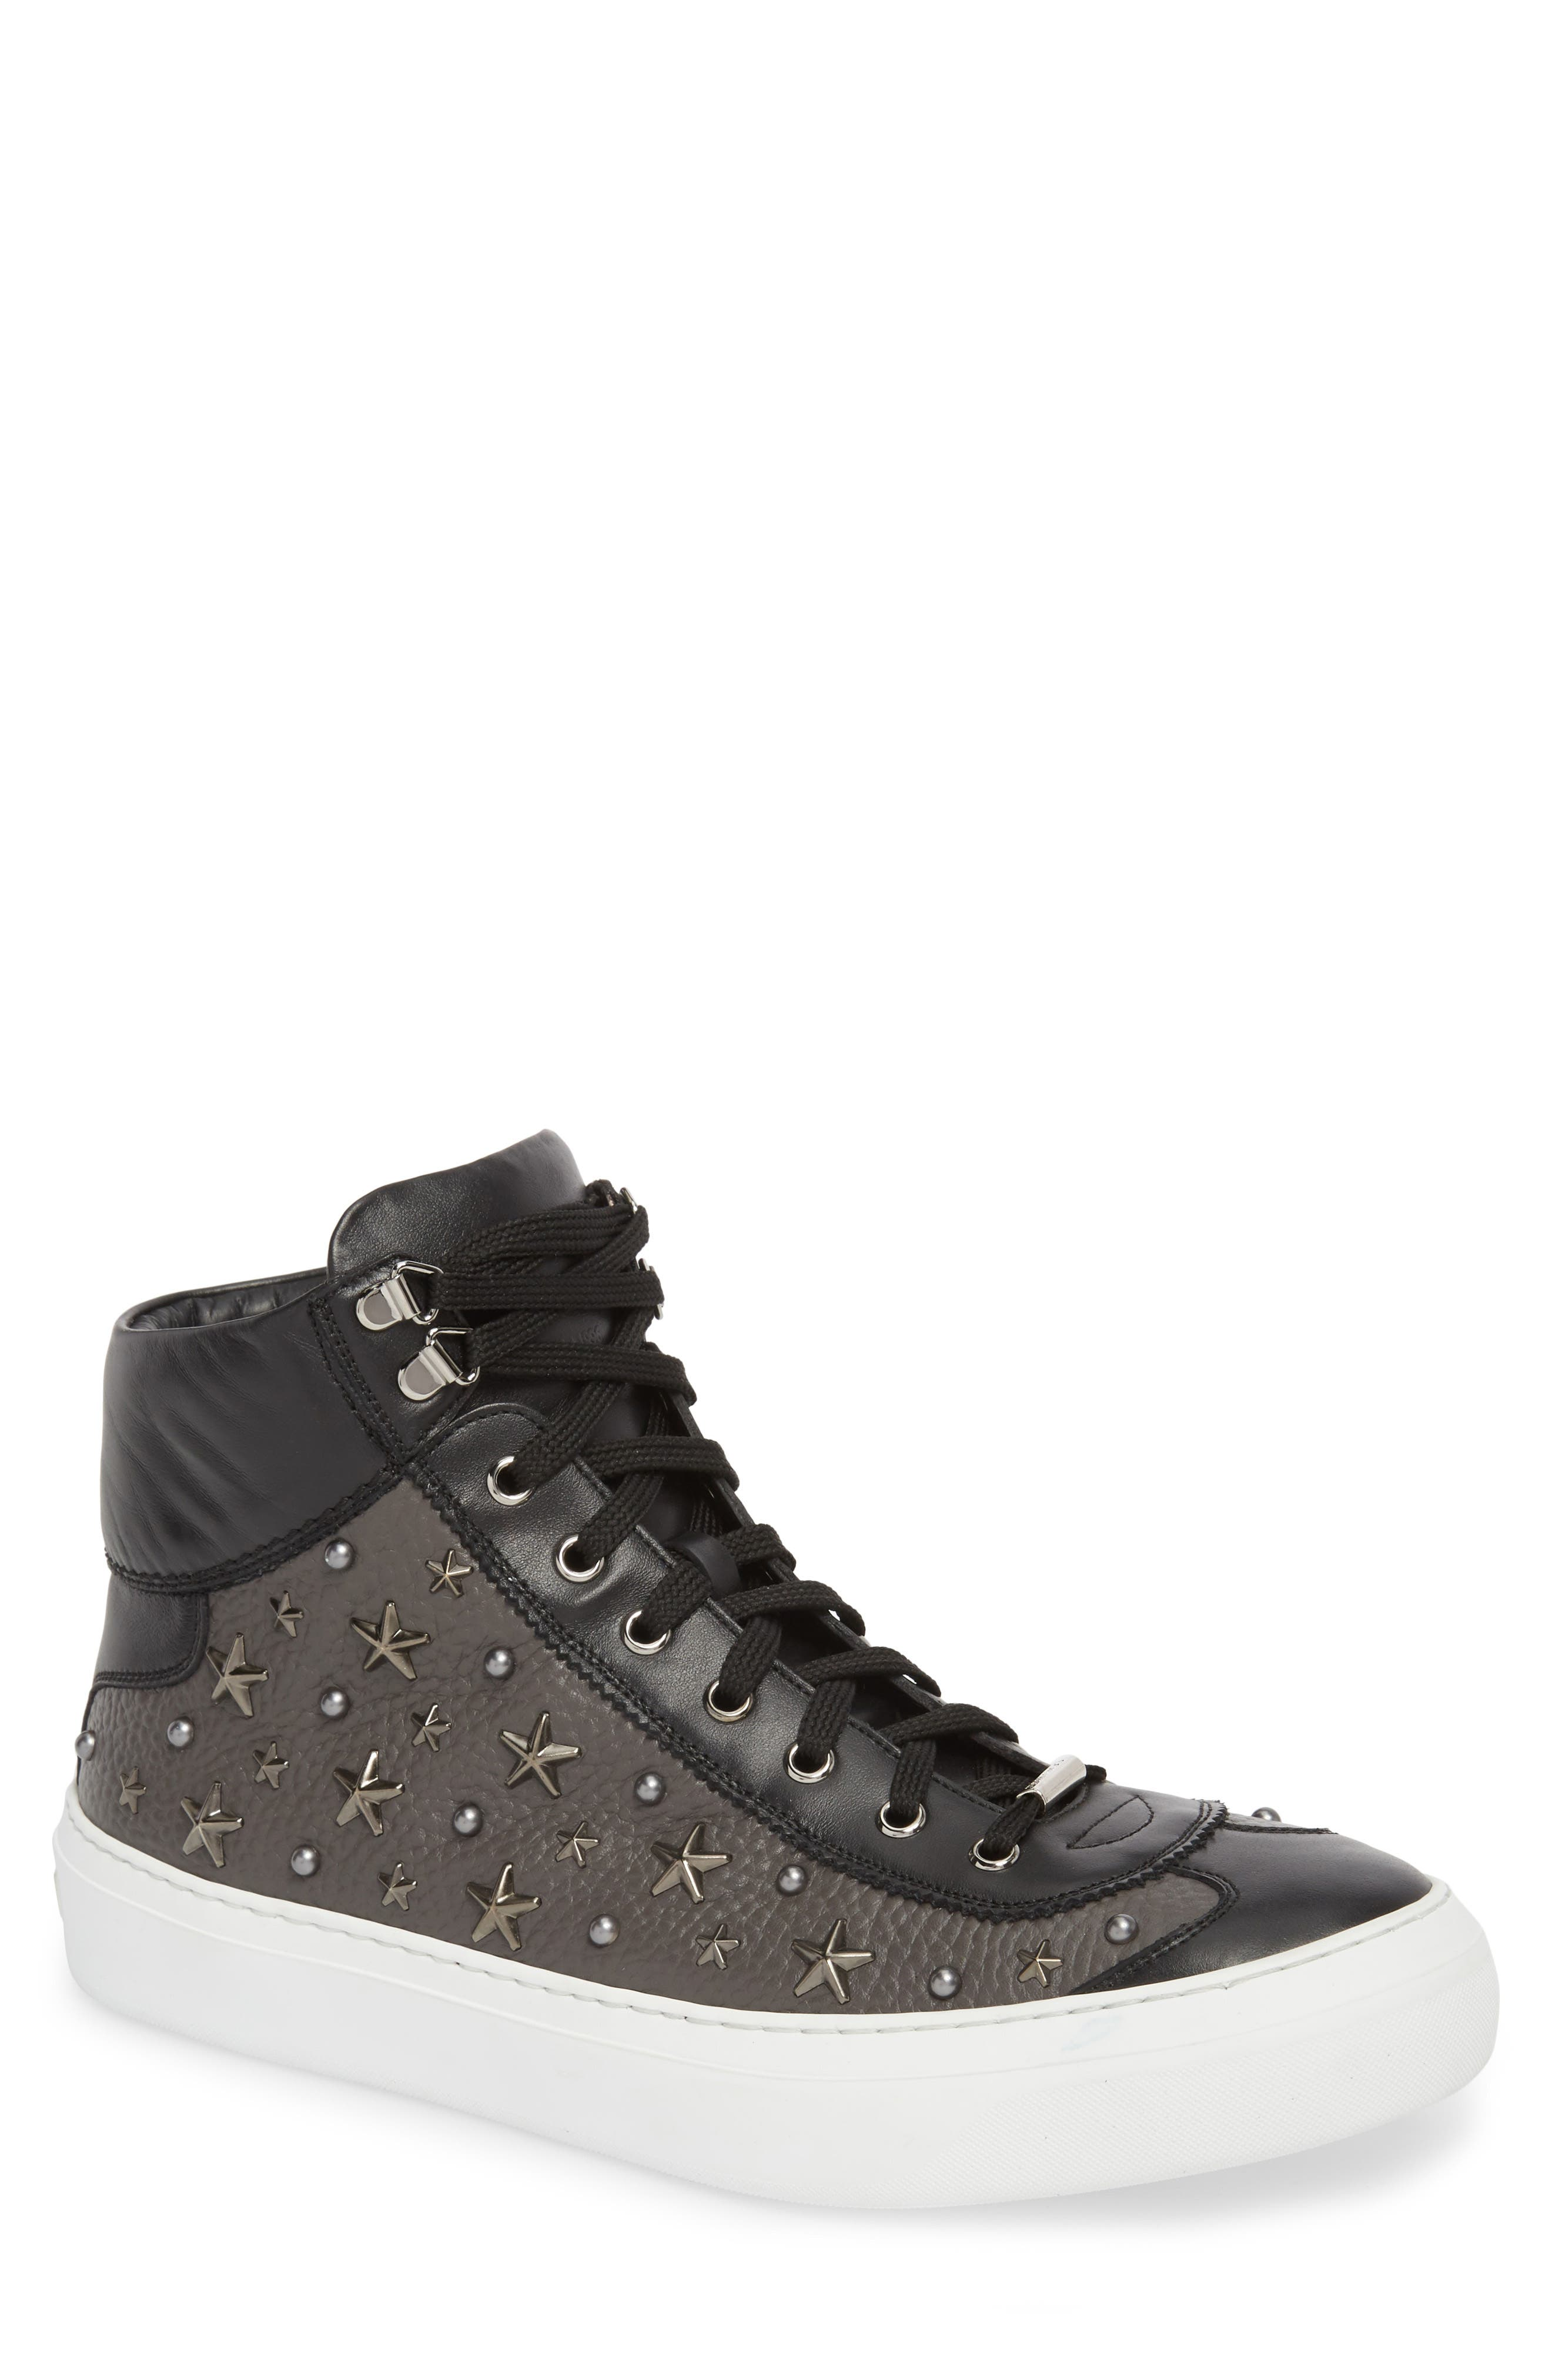 Argyle Sneaker,                             Main thumbnail 1, color,                             021